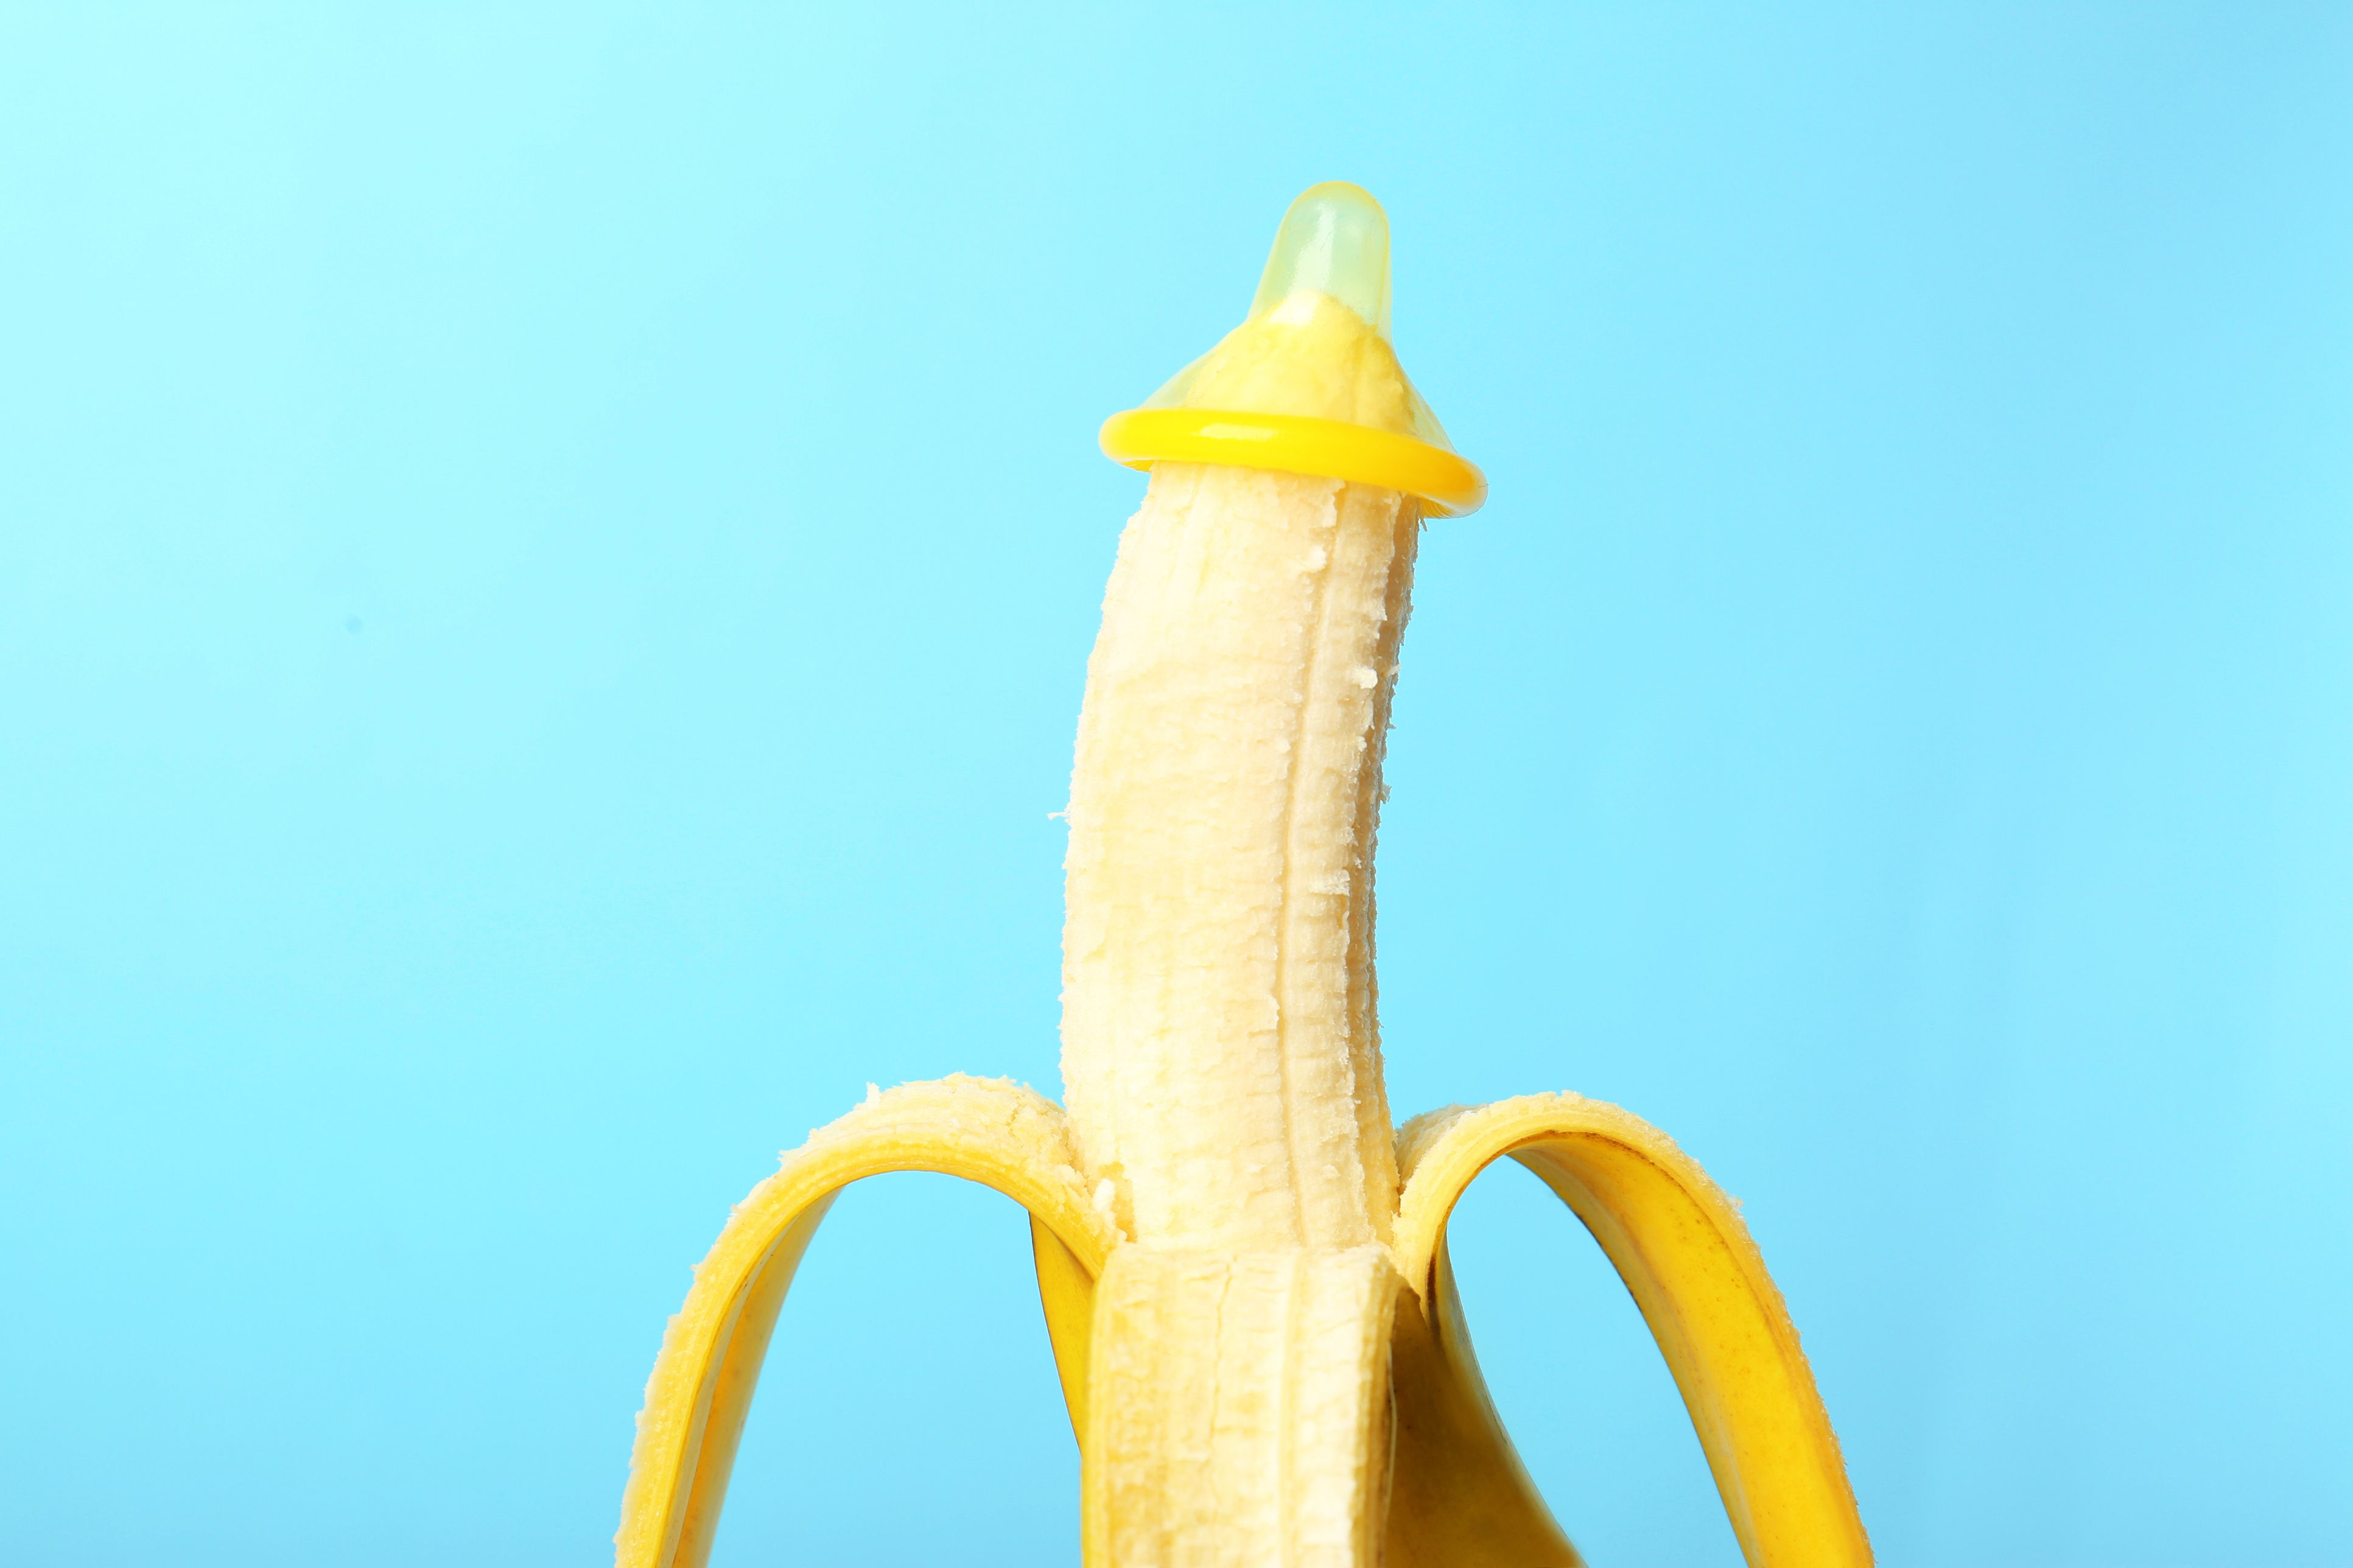 Condom on banana against color background. Safe sex concept